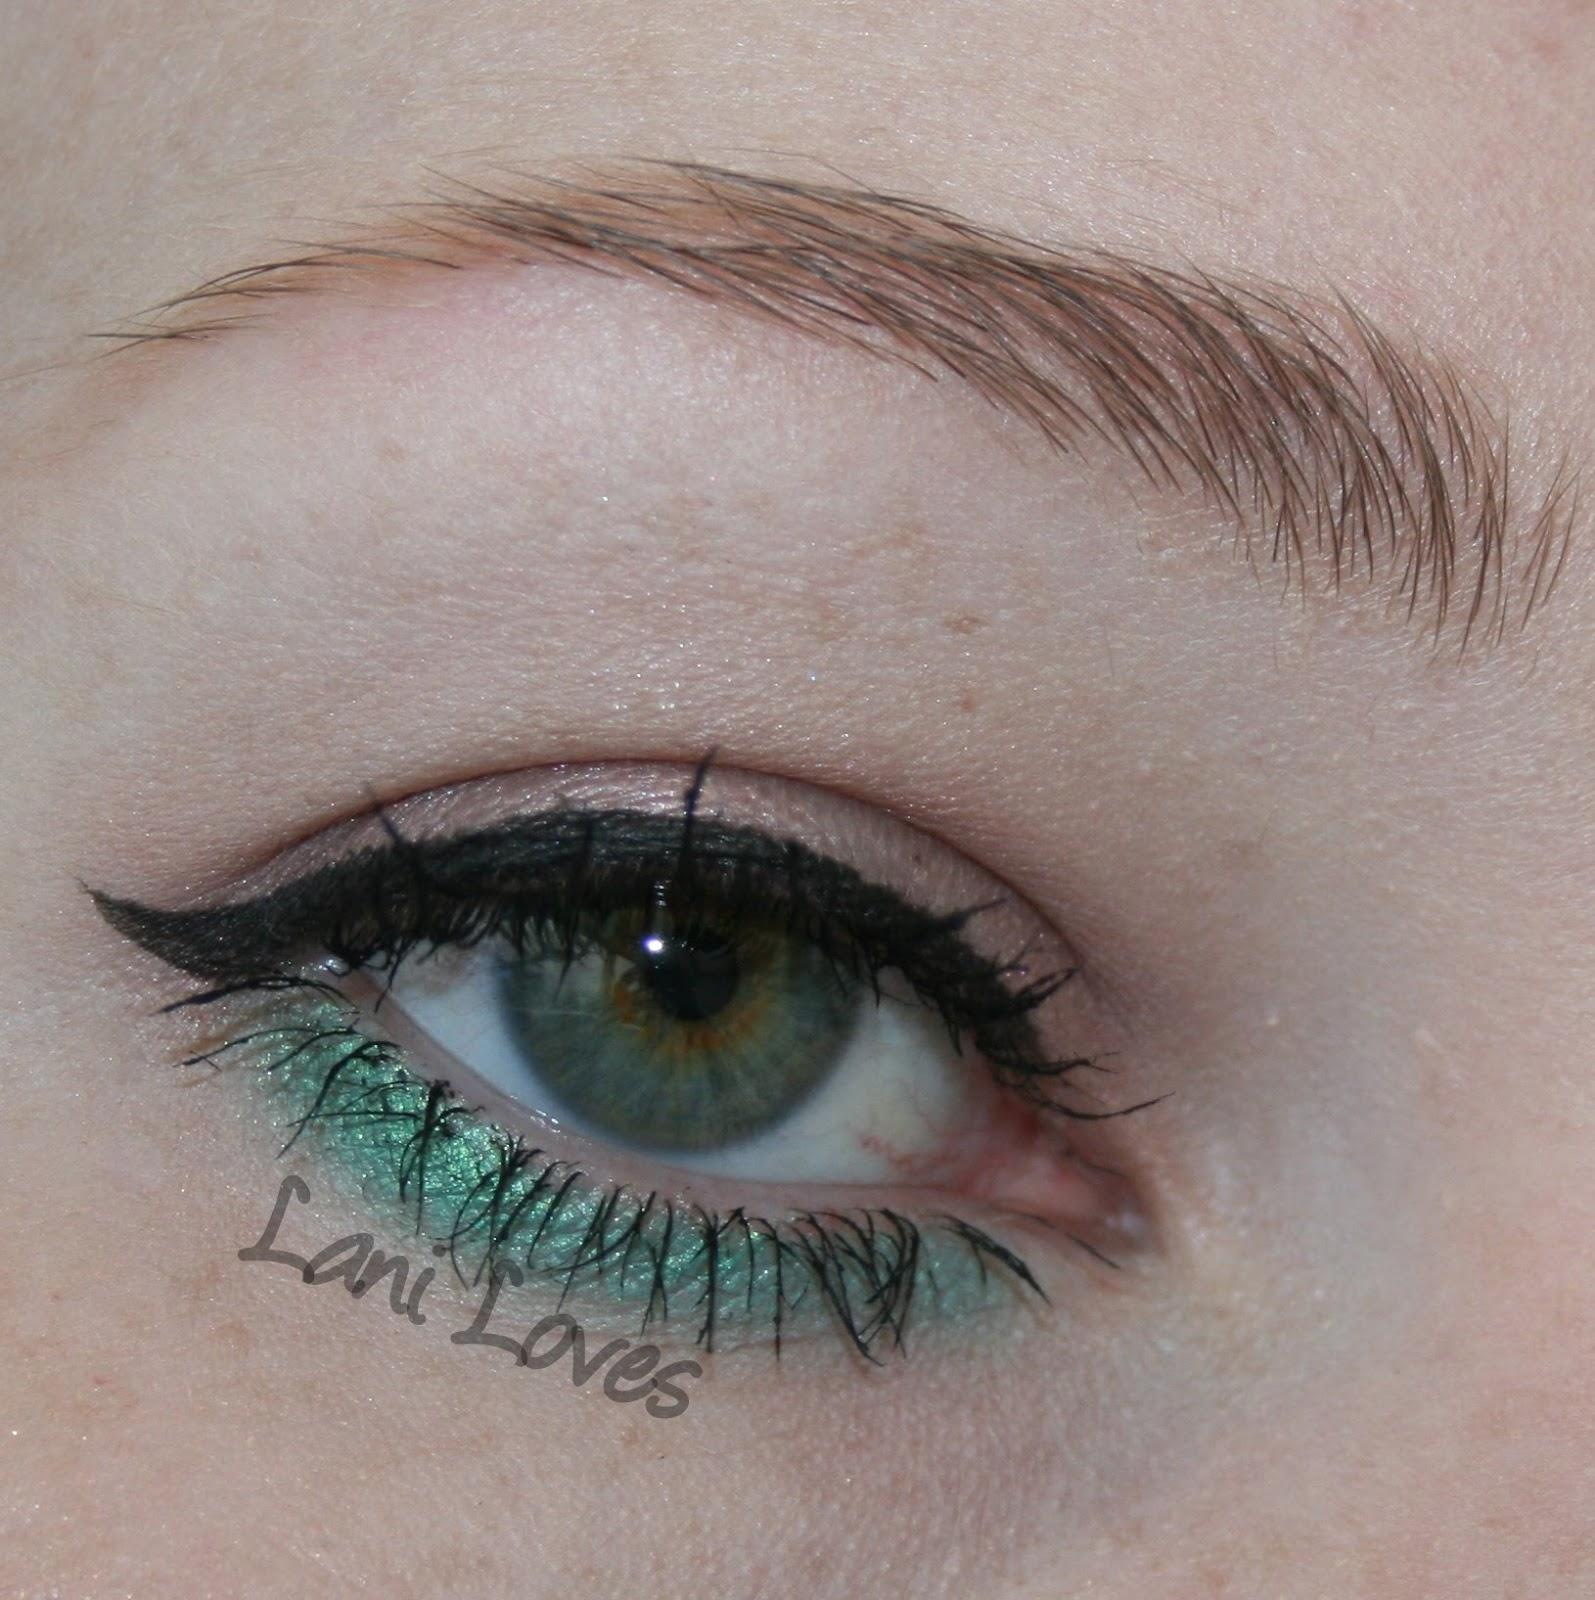 Femme Fatale Cosmetics Emerald Dream EOTD